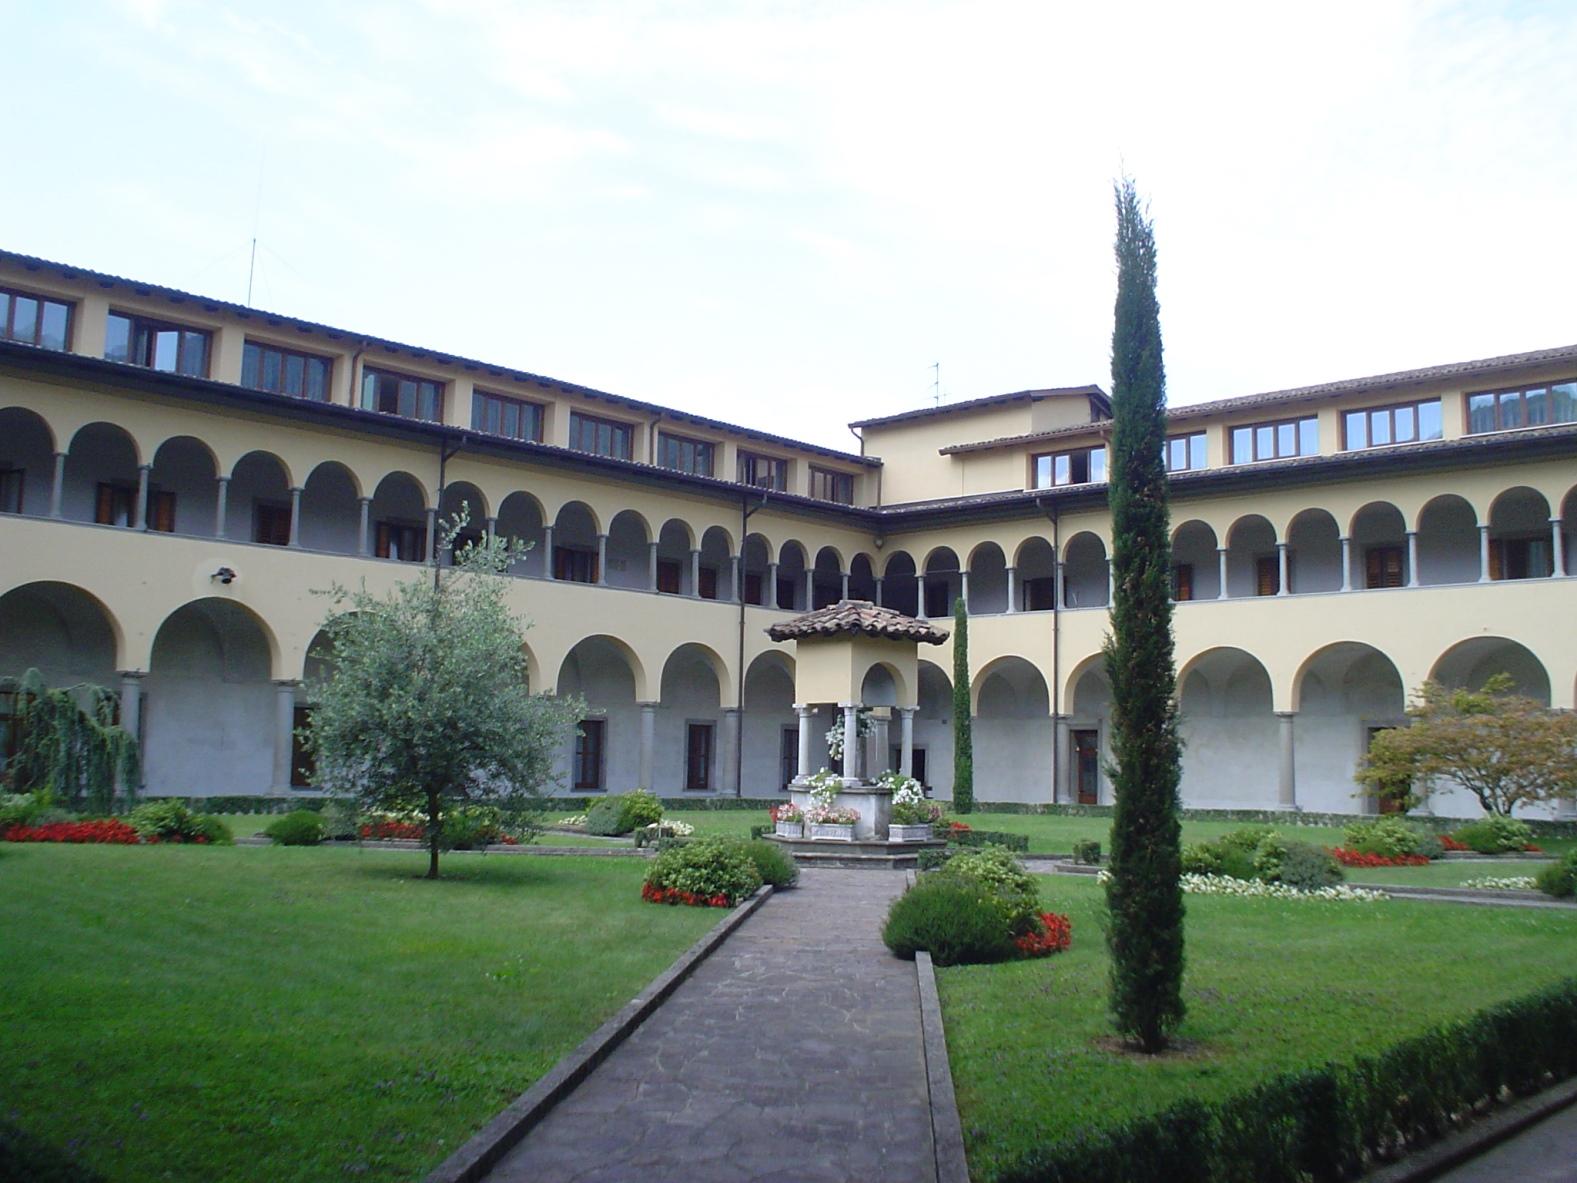 Convento orsoline Gandino